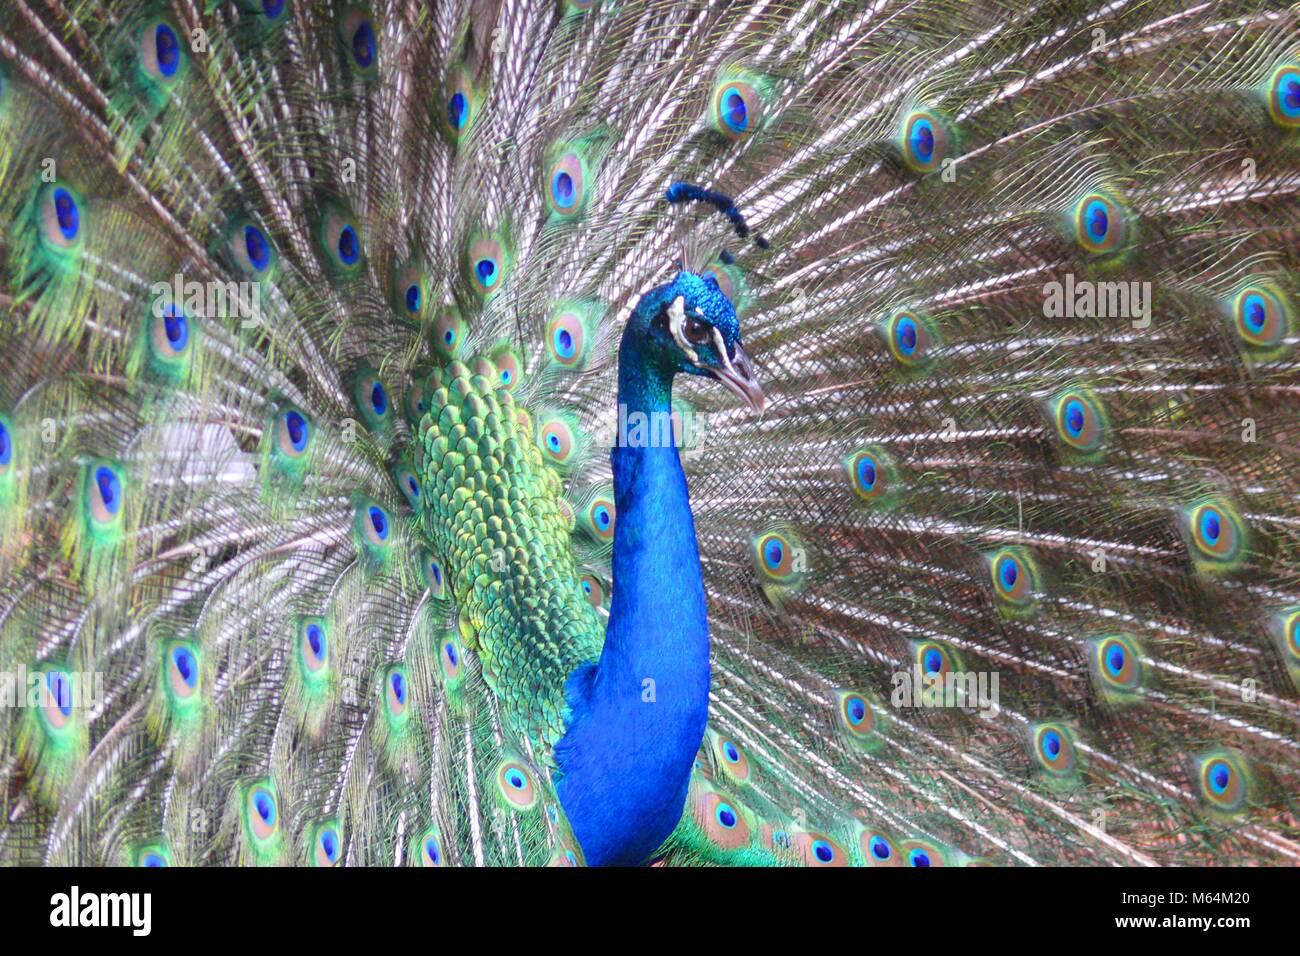 Peacock fanning its tail. Taken at Ellen Trout Zoo in Lufkin, TX - Stock Image